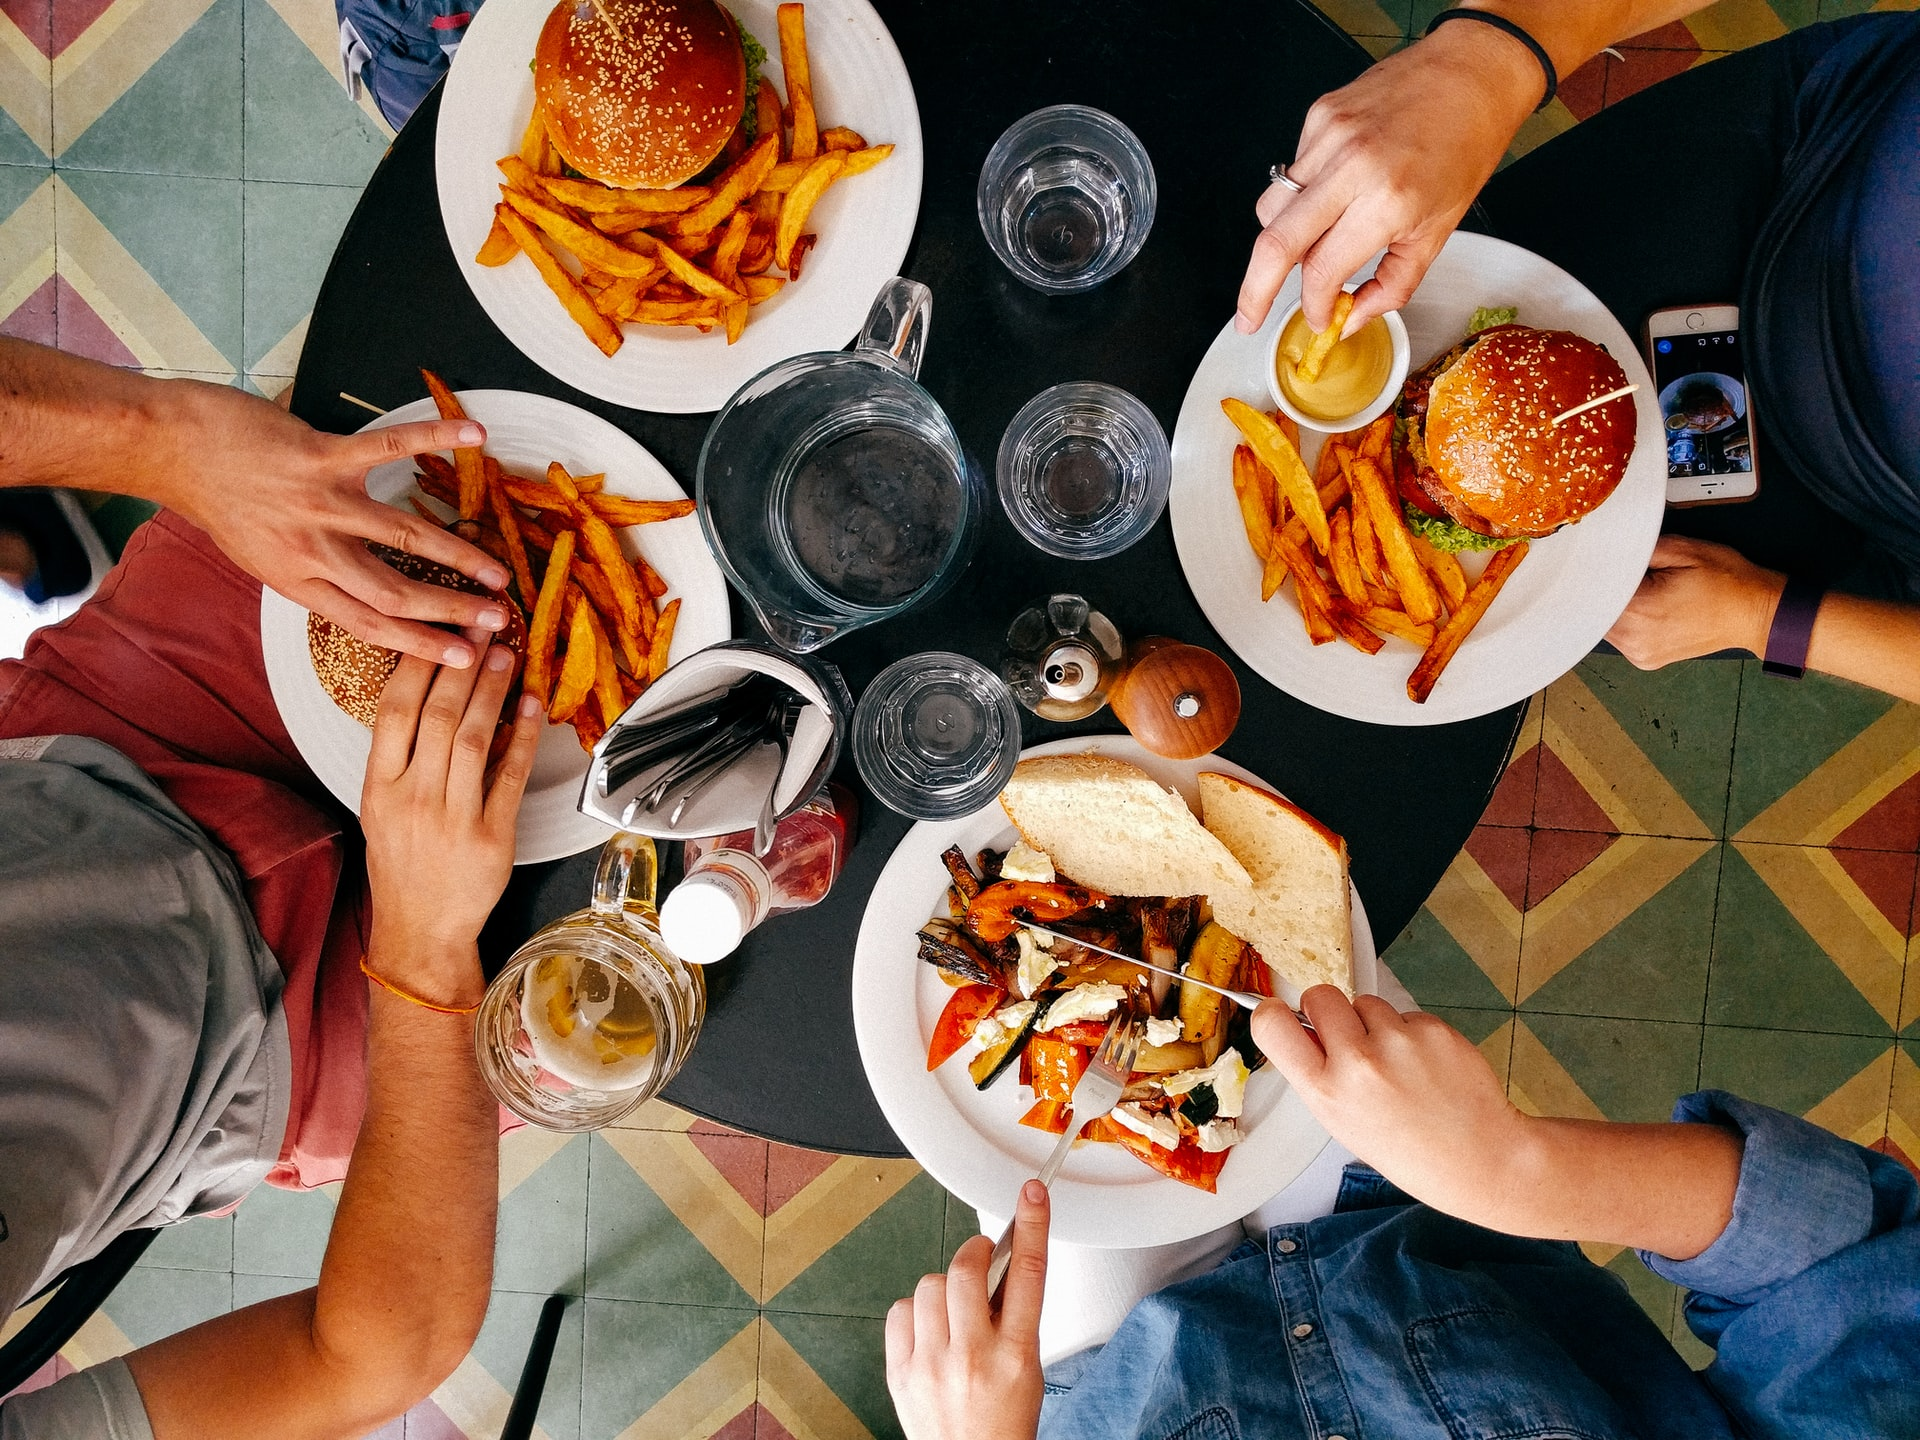 8 IG worthy Miami Meals